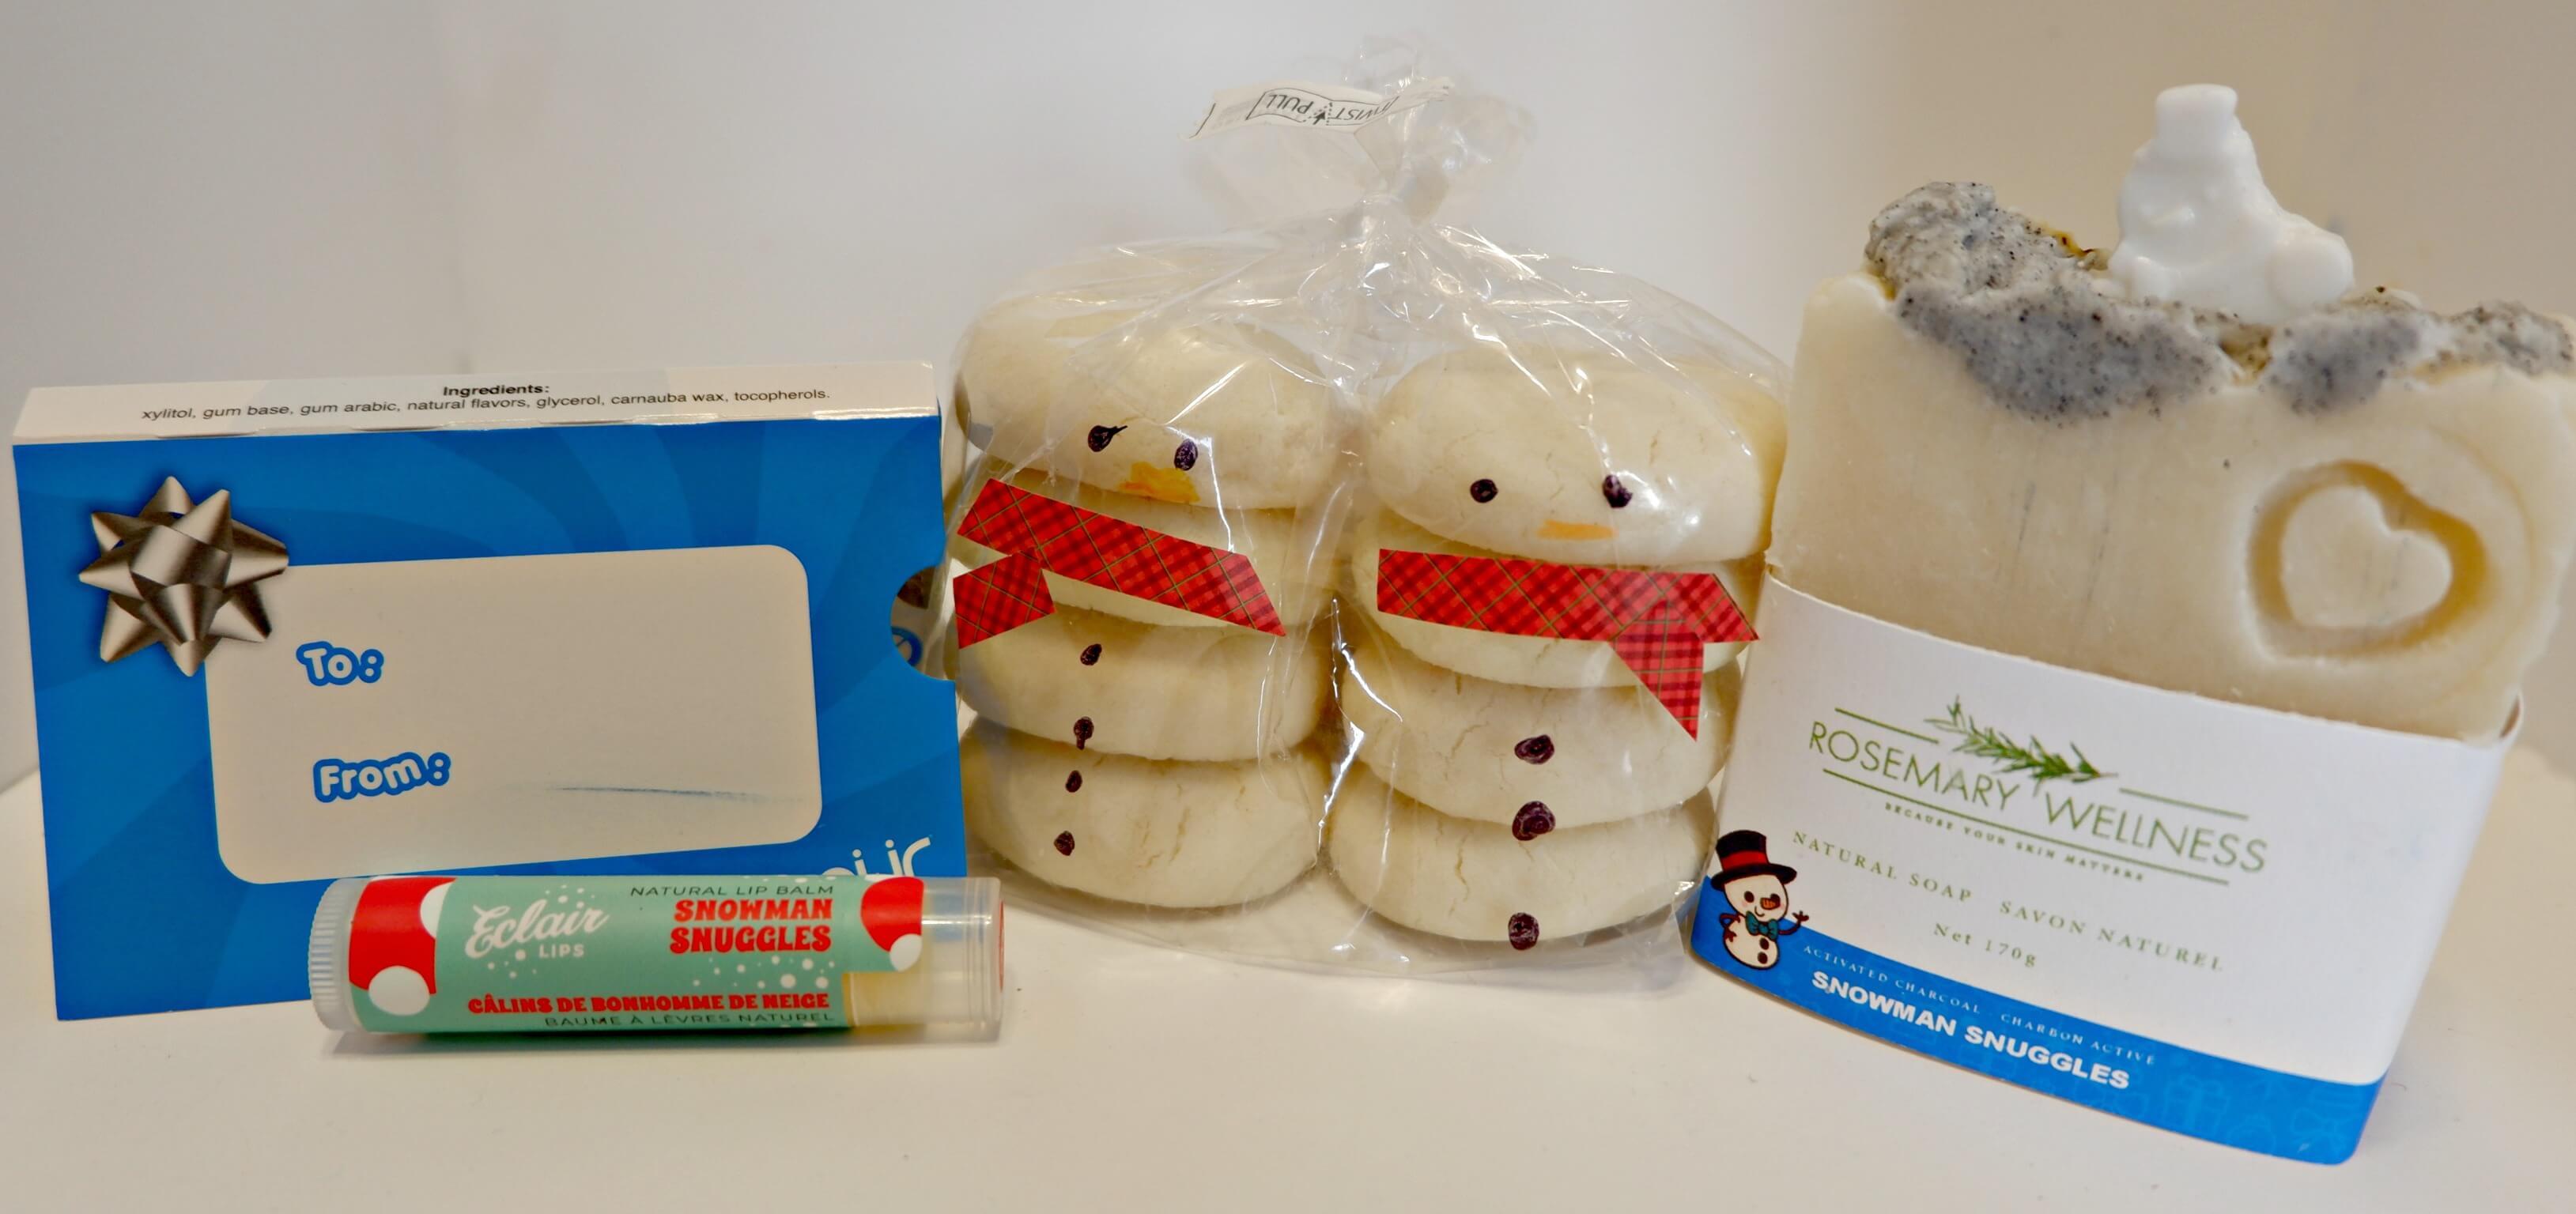 sequoia downtown gift ideas teacher christmas thank you snowman snuggles eclair lips rosemary wellness schoolhouse gluten free